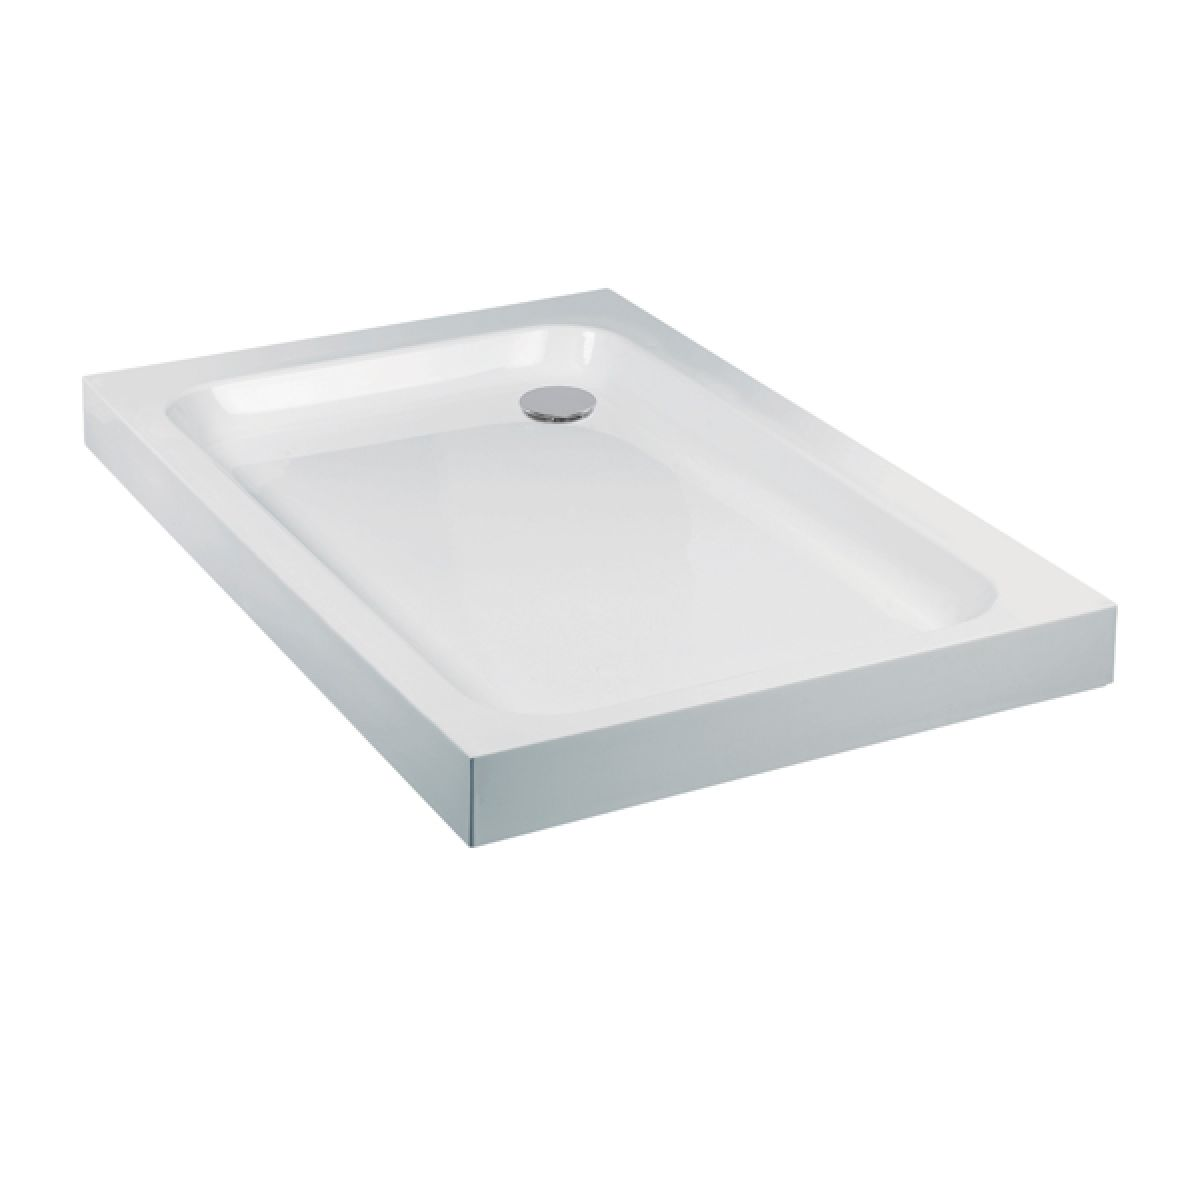 Frontline Standard Rectanglular Shower Tray 1400 x 900mm